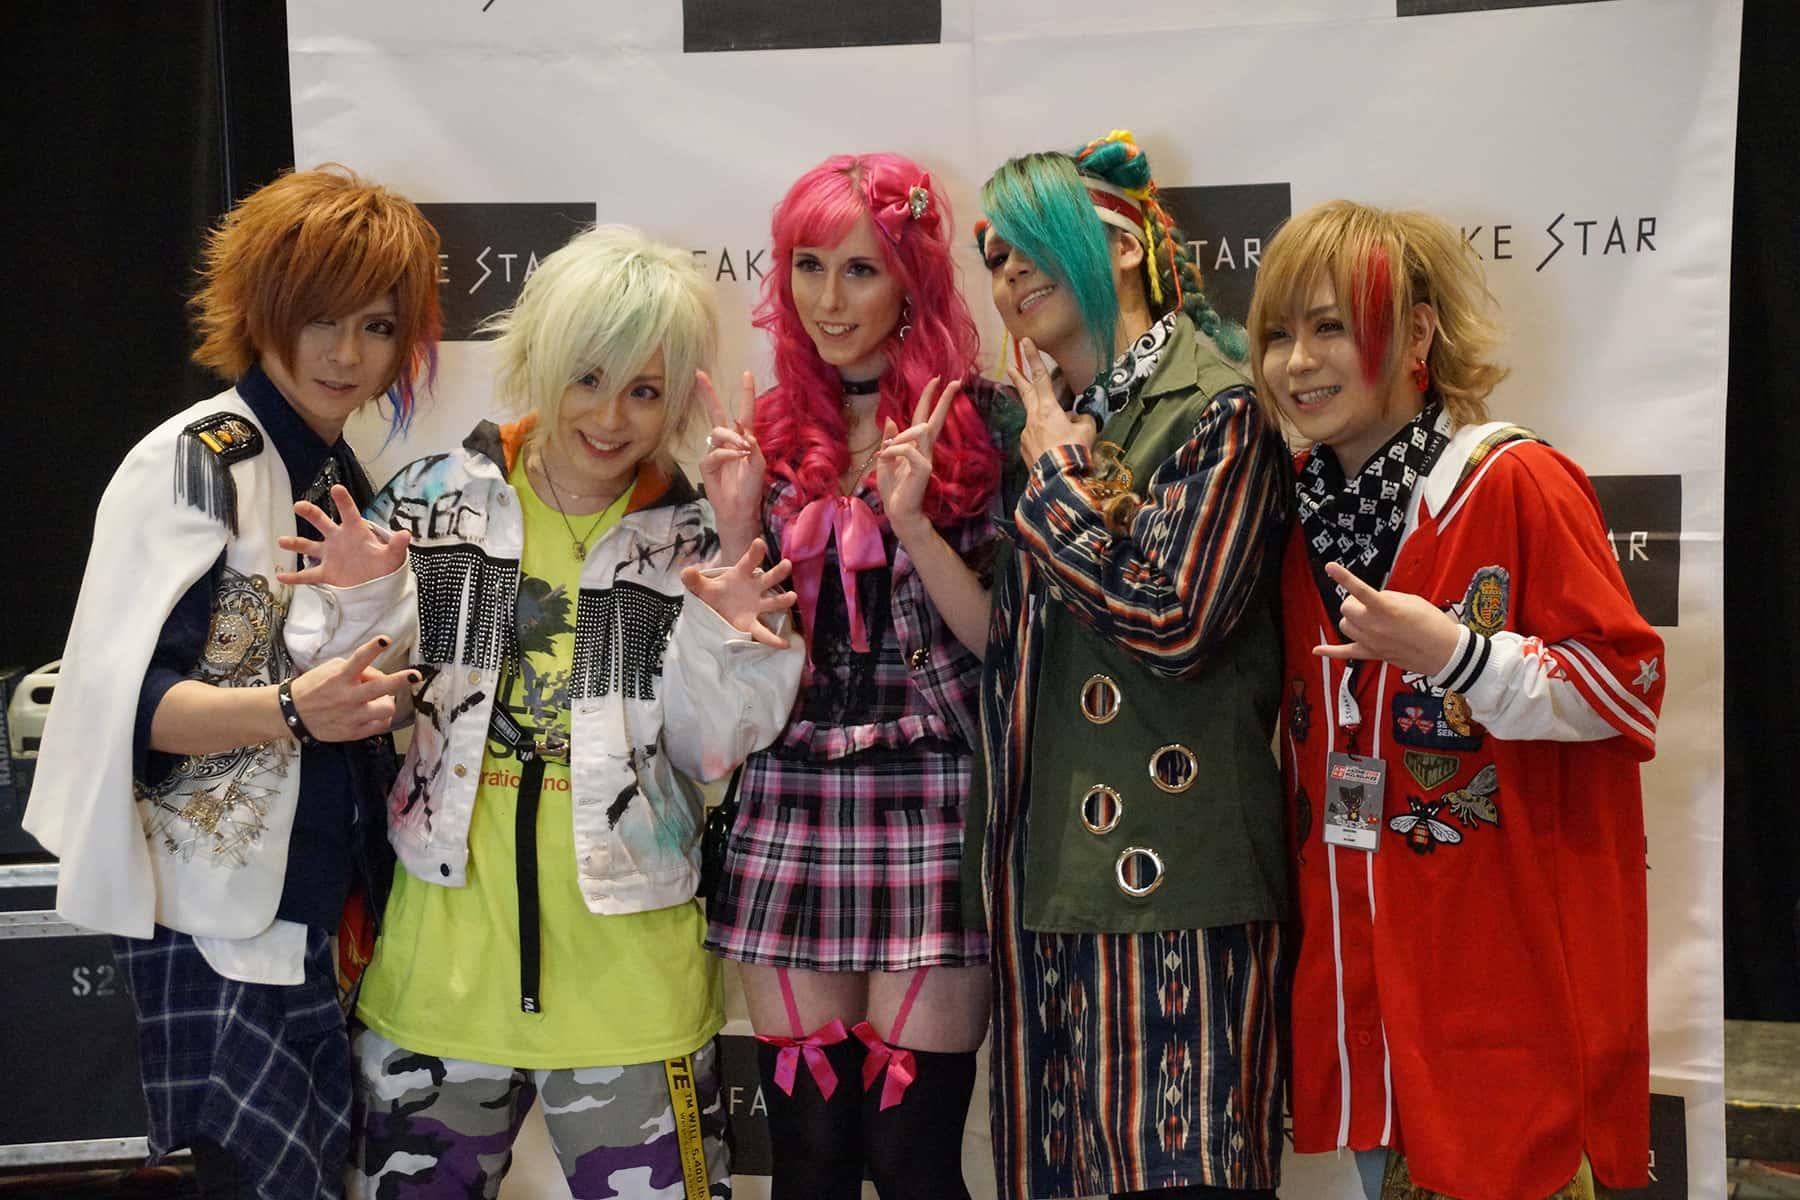 05_021519_animemke_1136